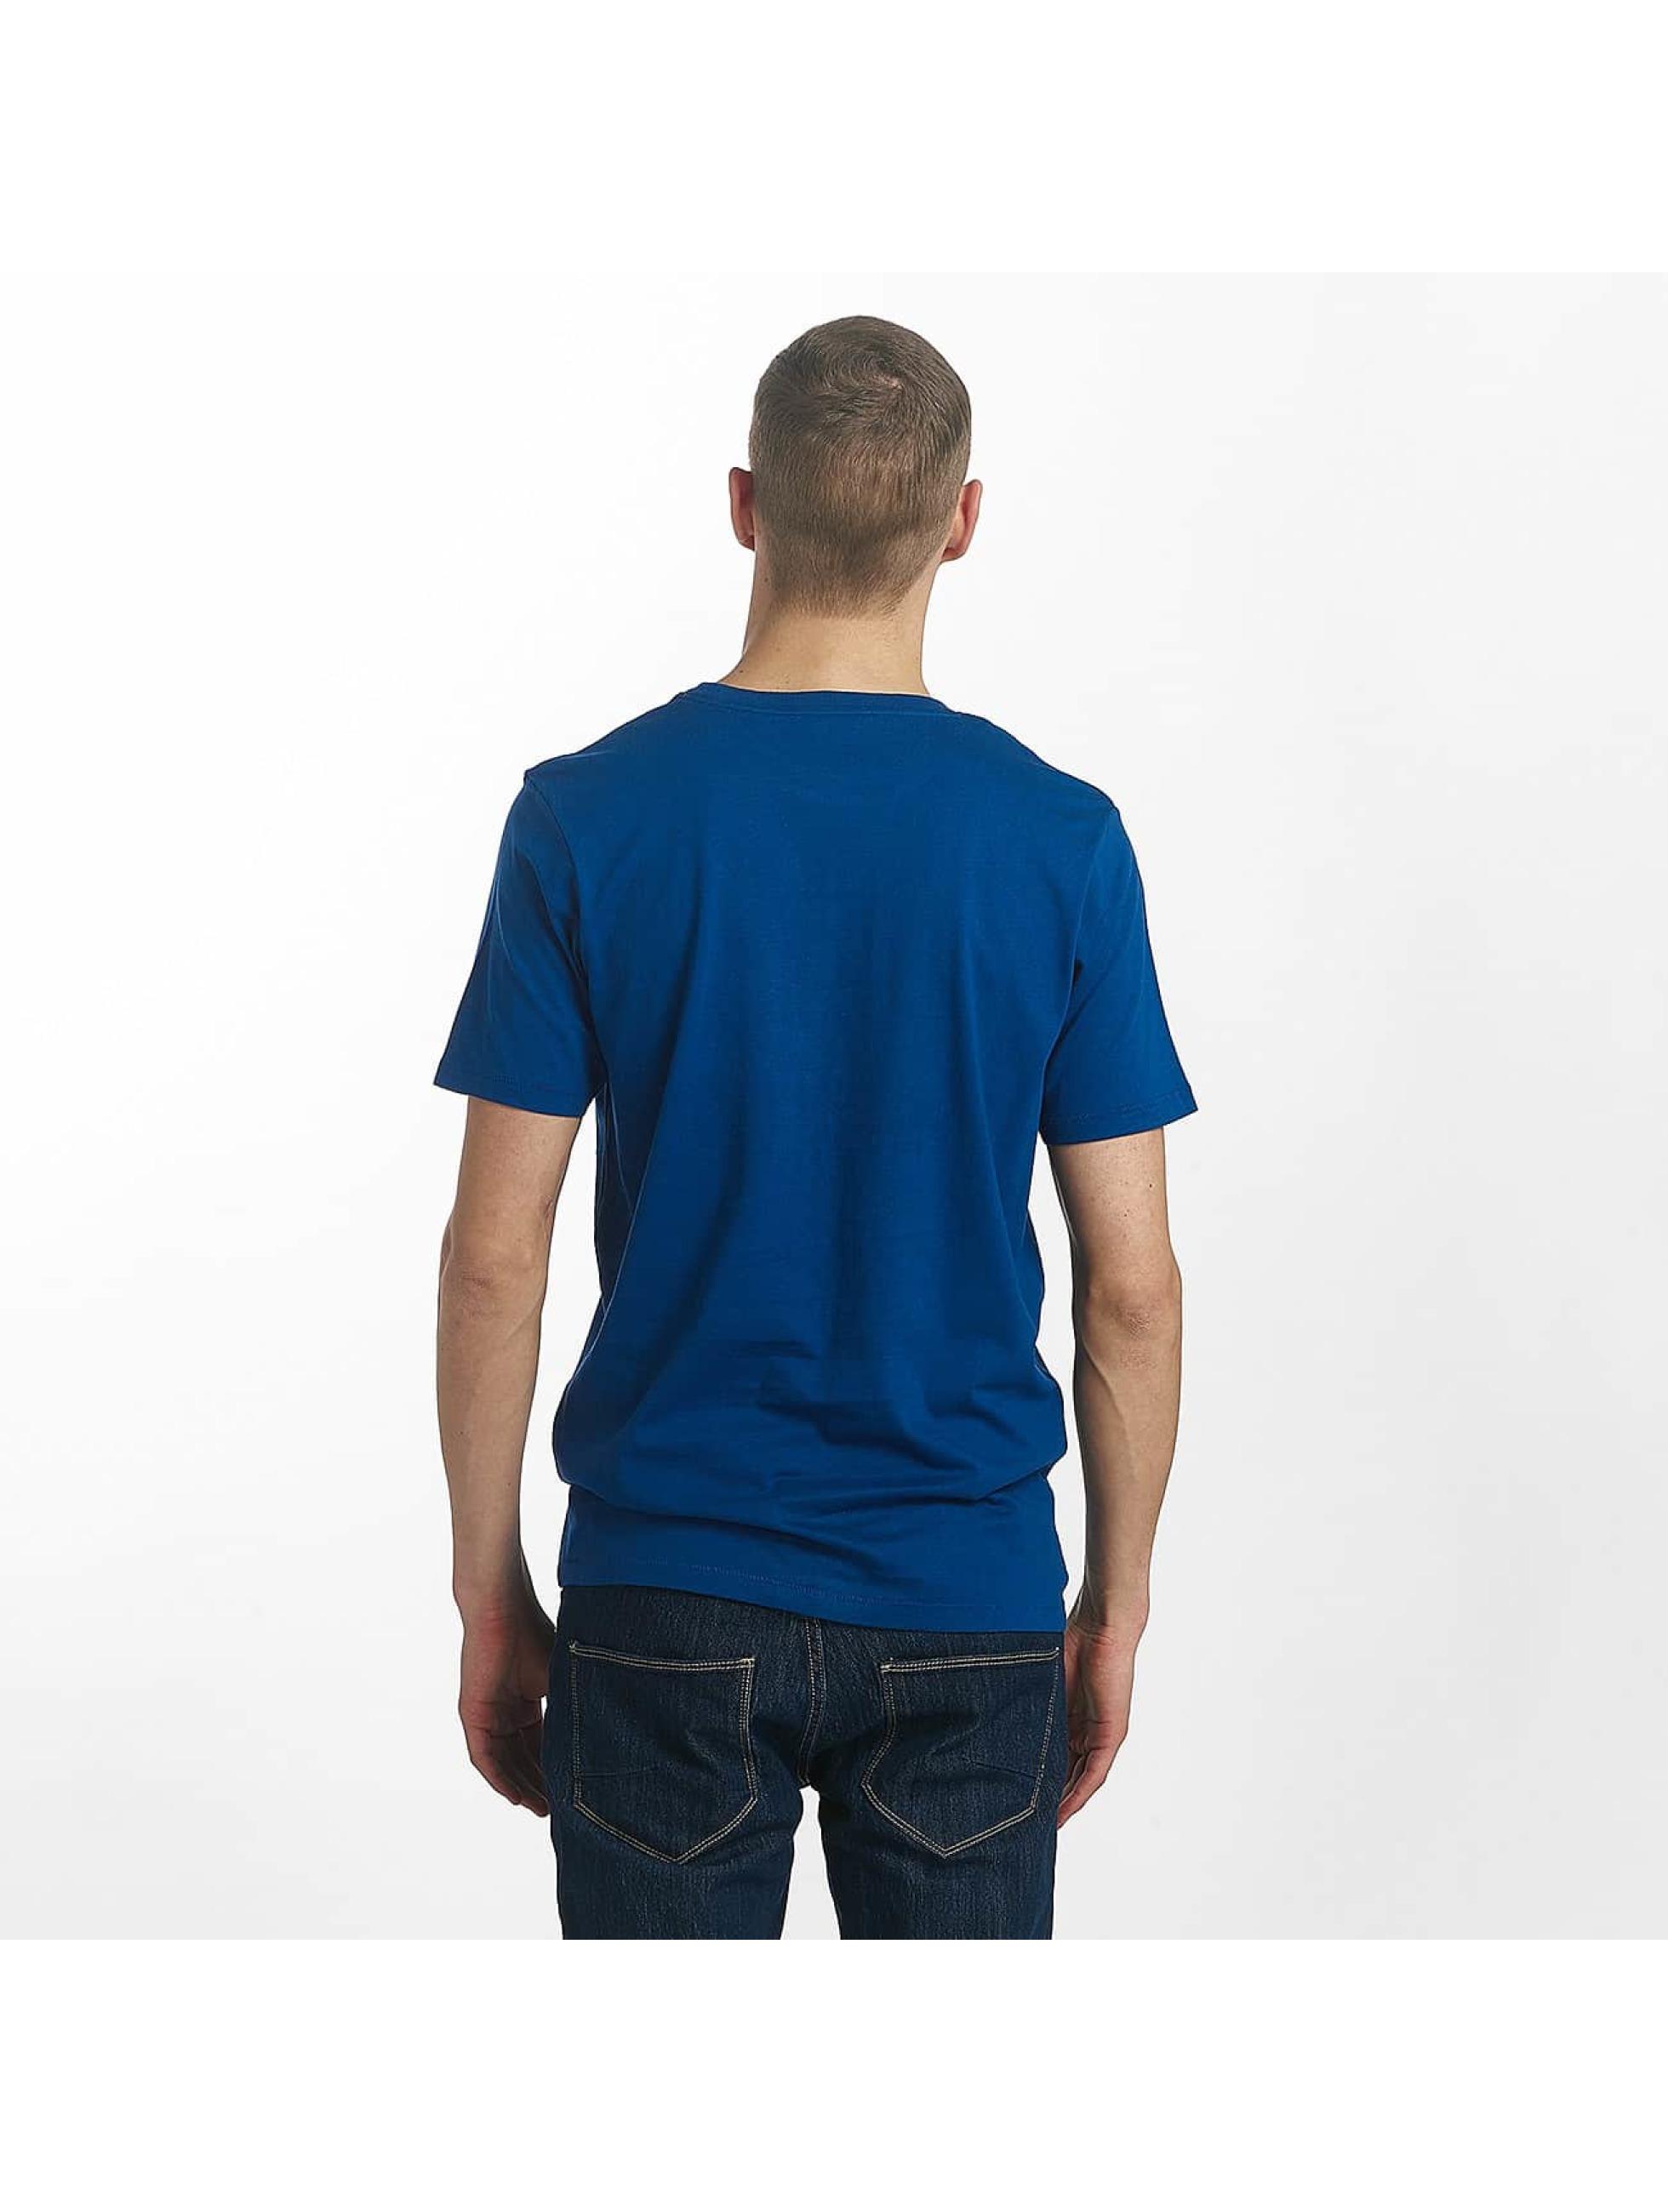 Jack & Jones T-Shirt jorStencild blau